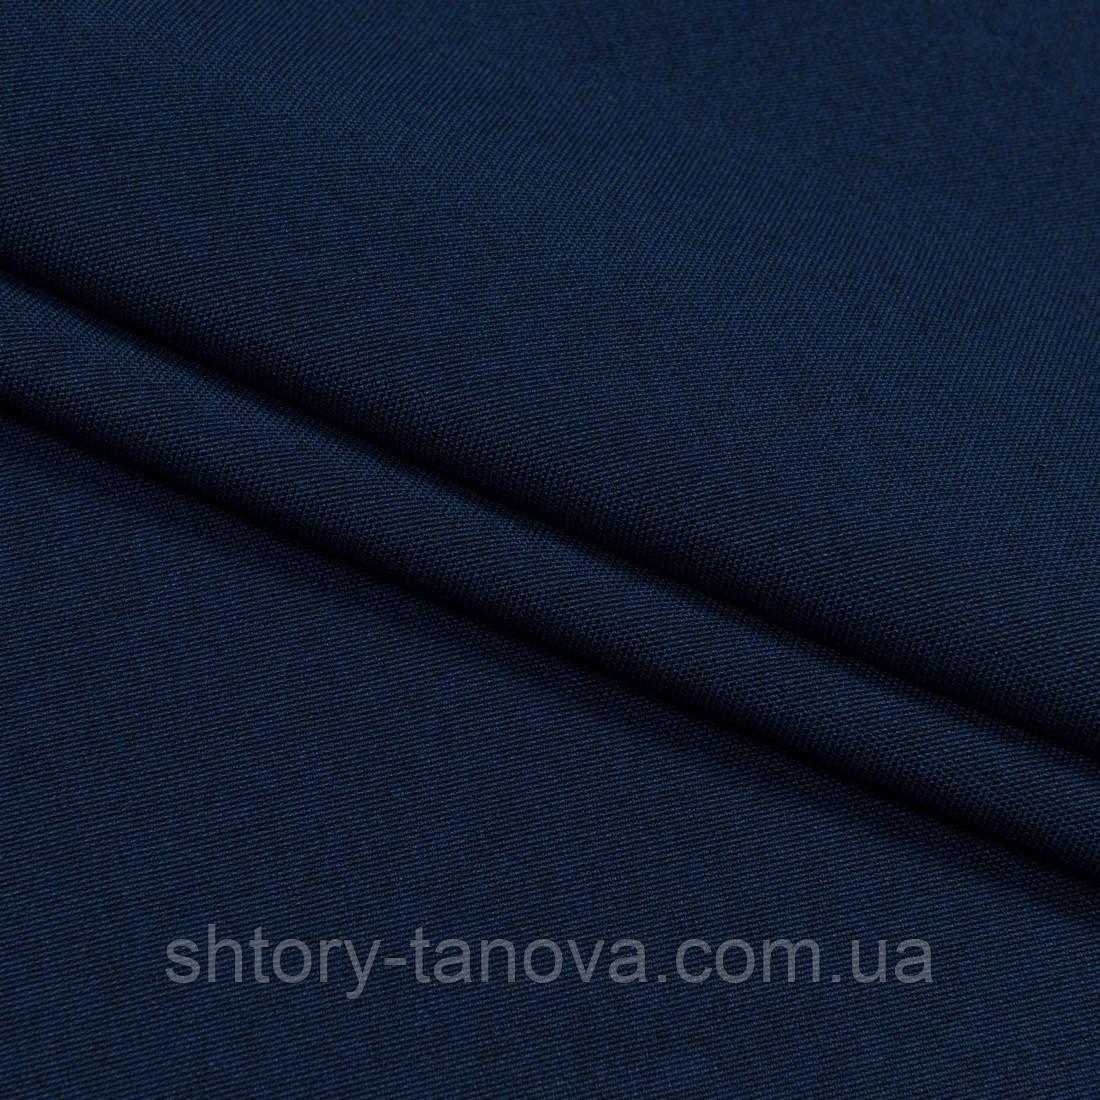 Декоративная ткань плотная рогожка  т.синий